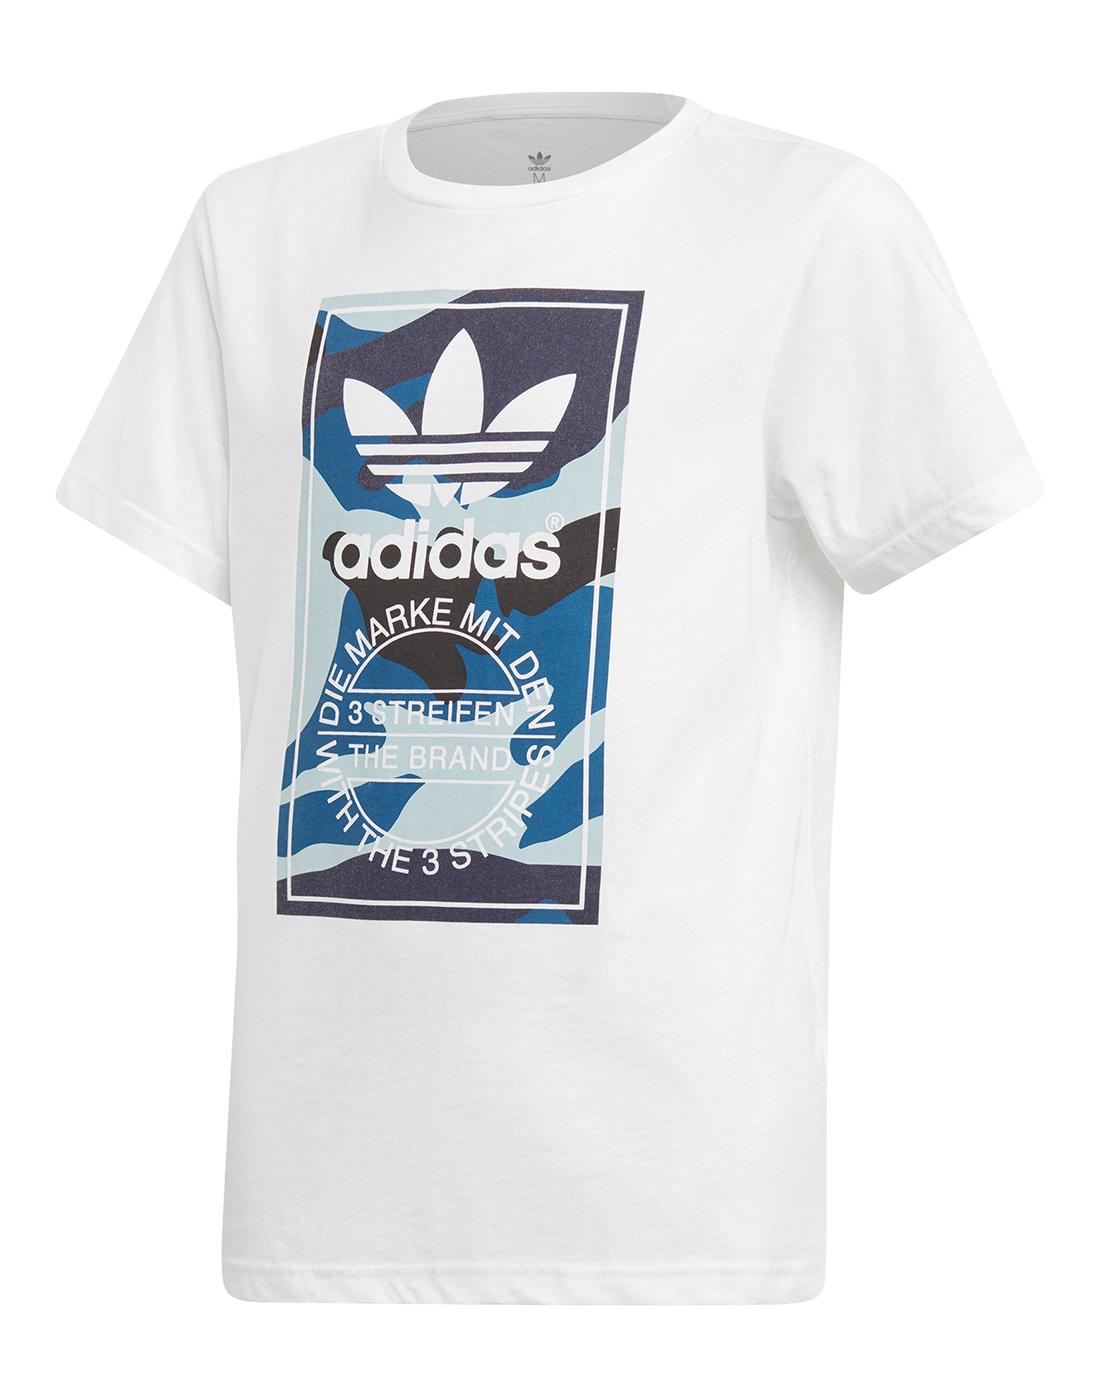 c9b91f4d5 adidas Originals Older Boys Camo Box T-Shirt | Life Style Sports